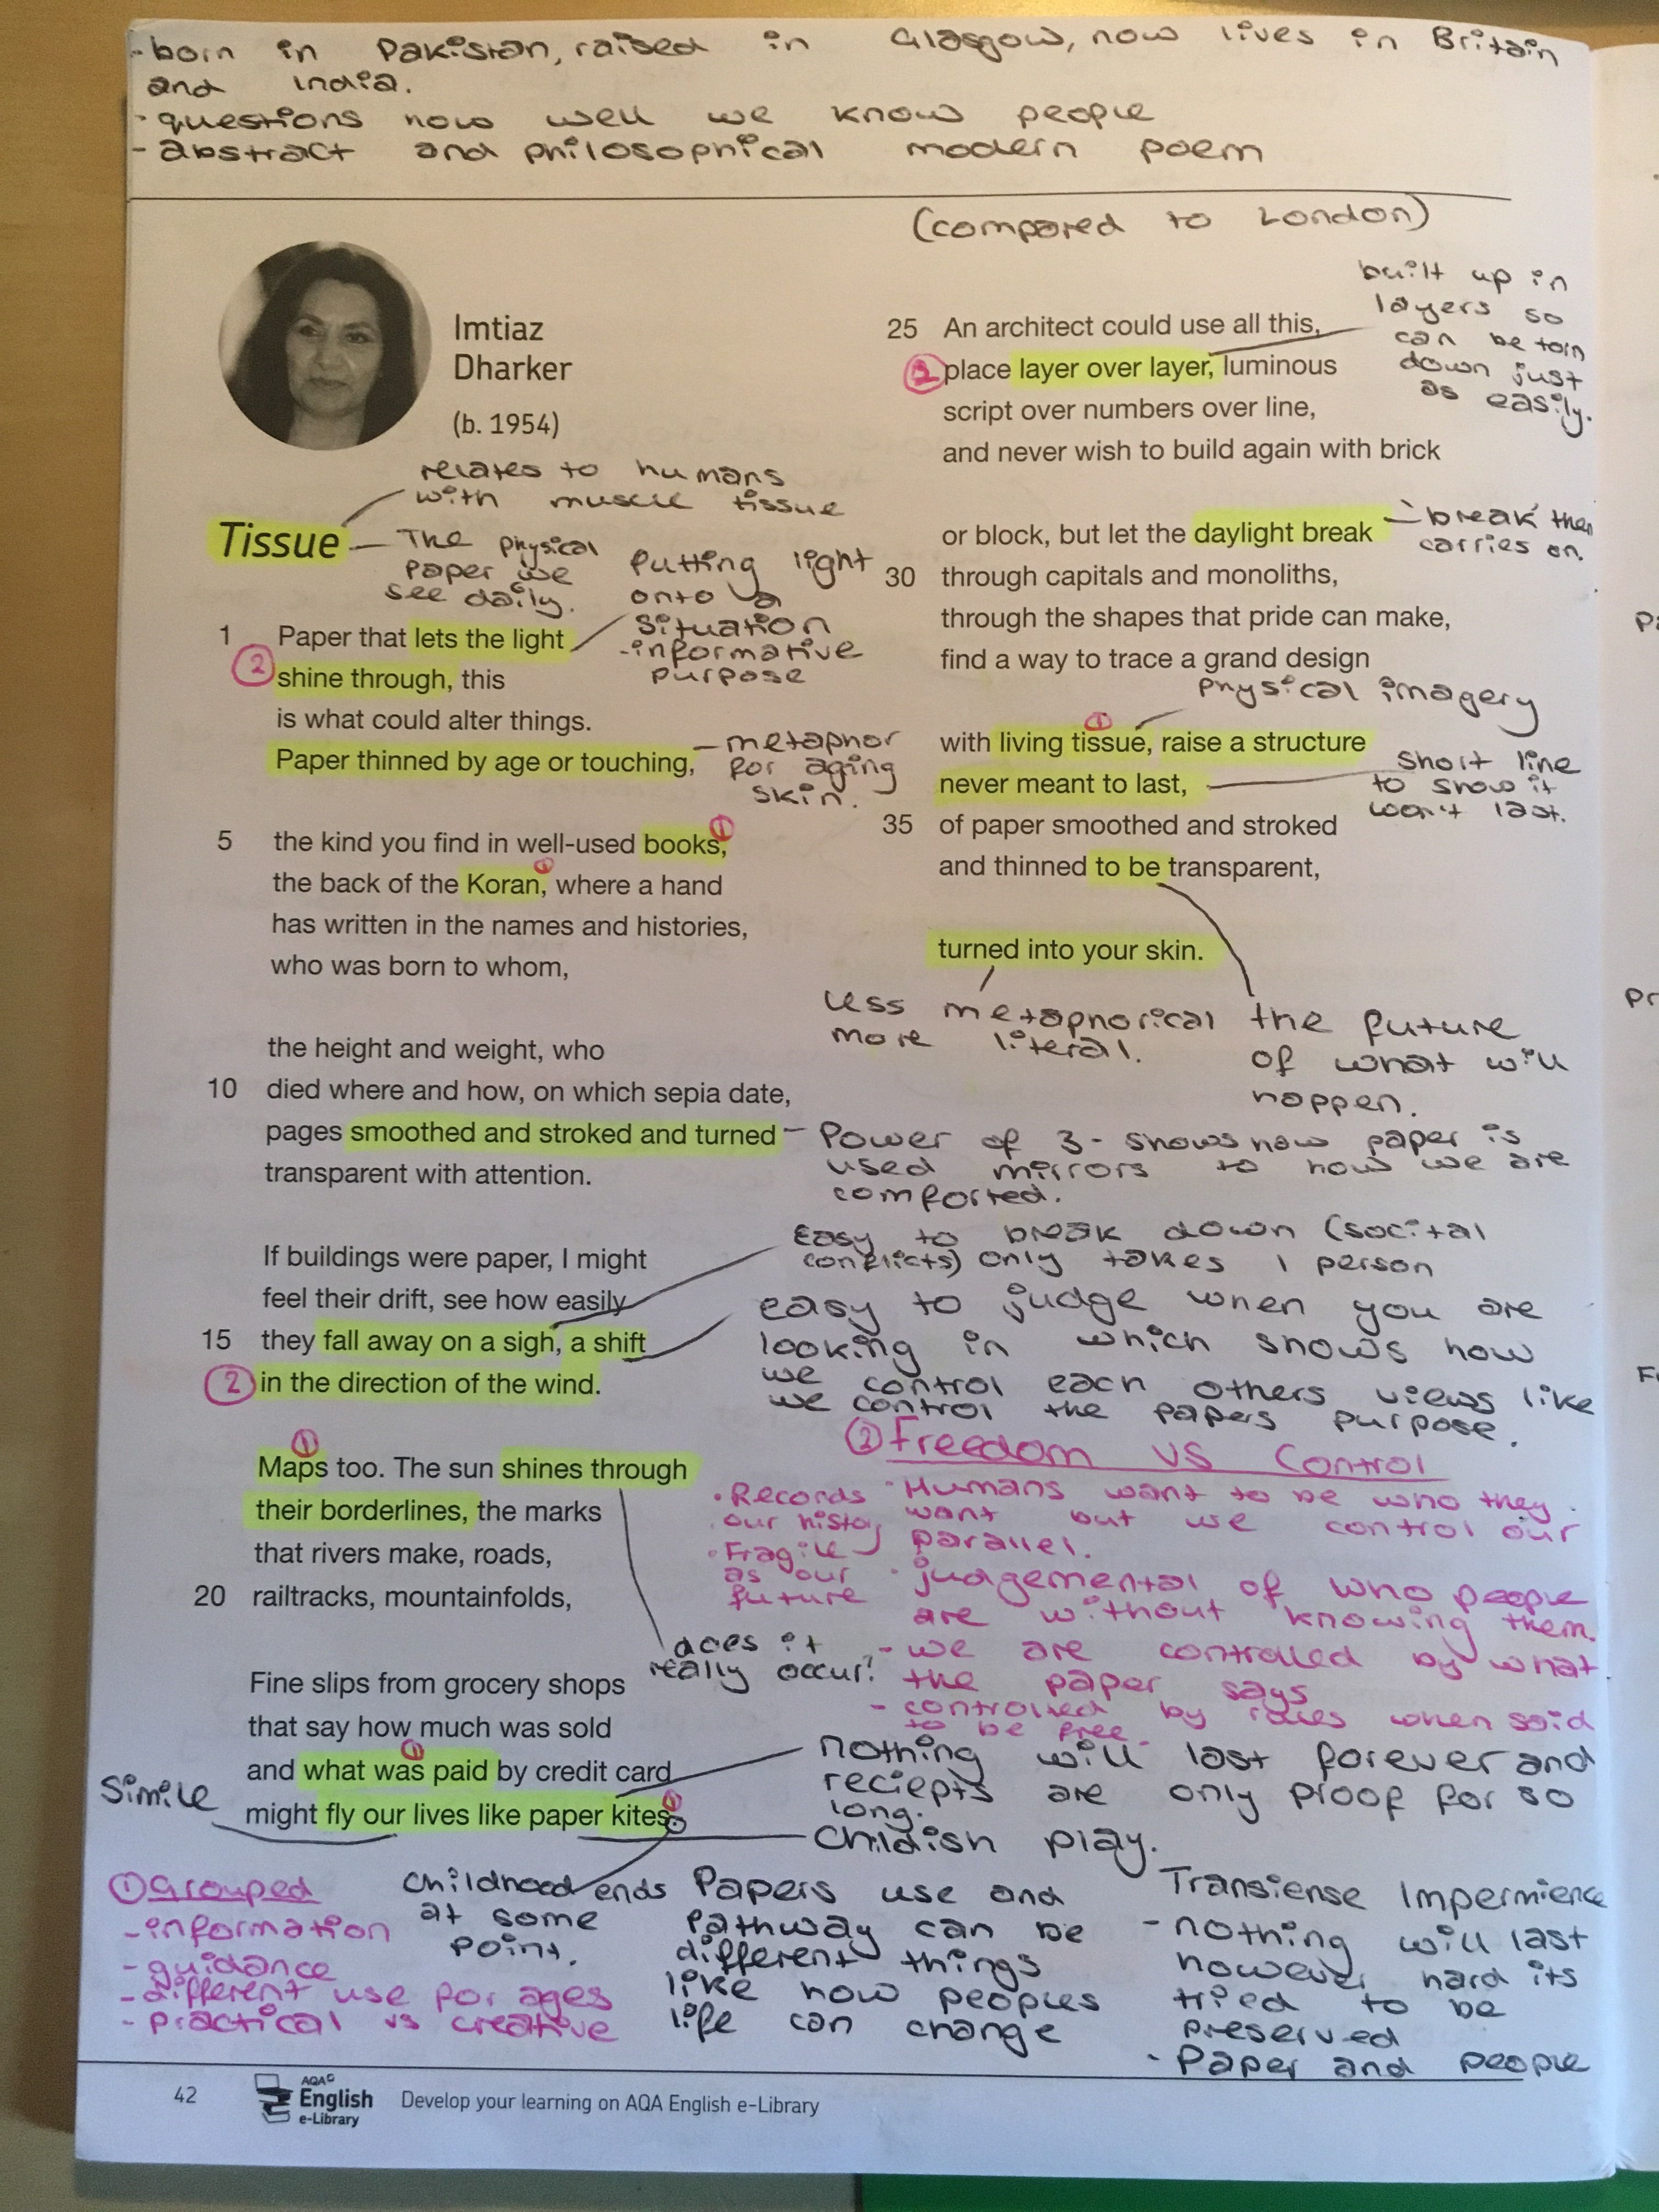 Tissue Gcse Poem English Literature Ozymandia By Percy Bysshe Shelley Analysis